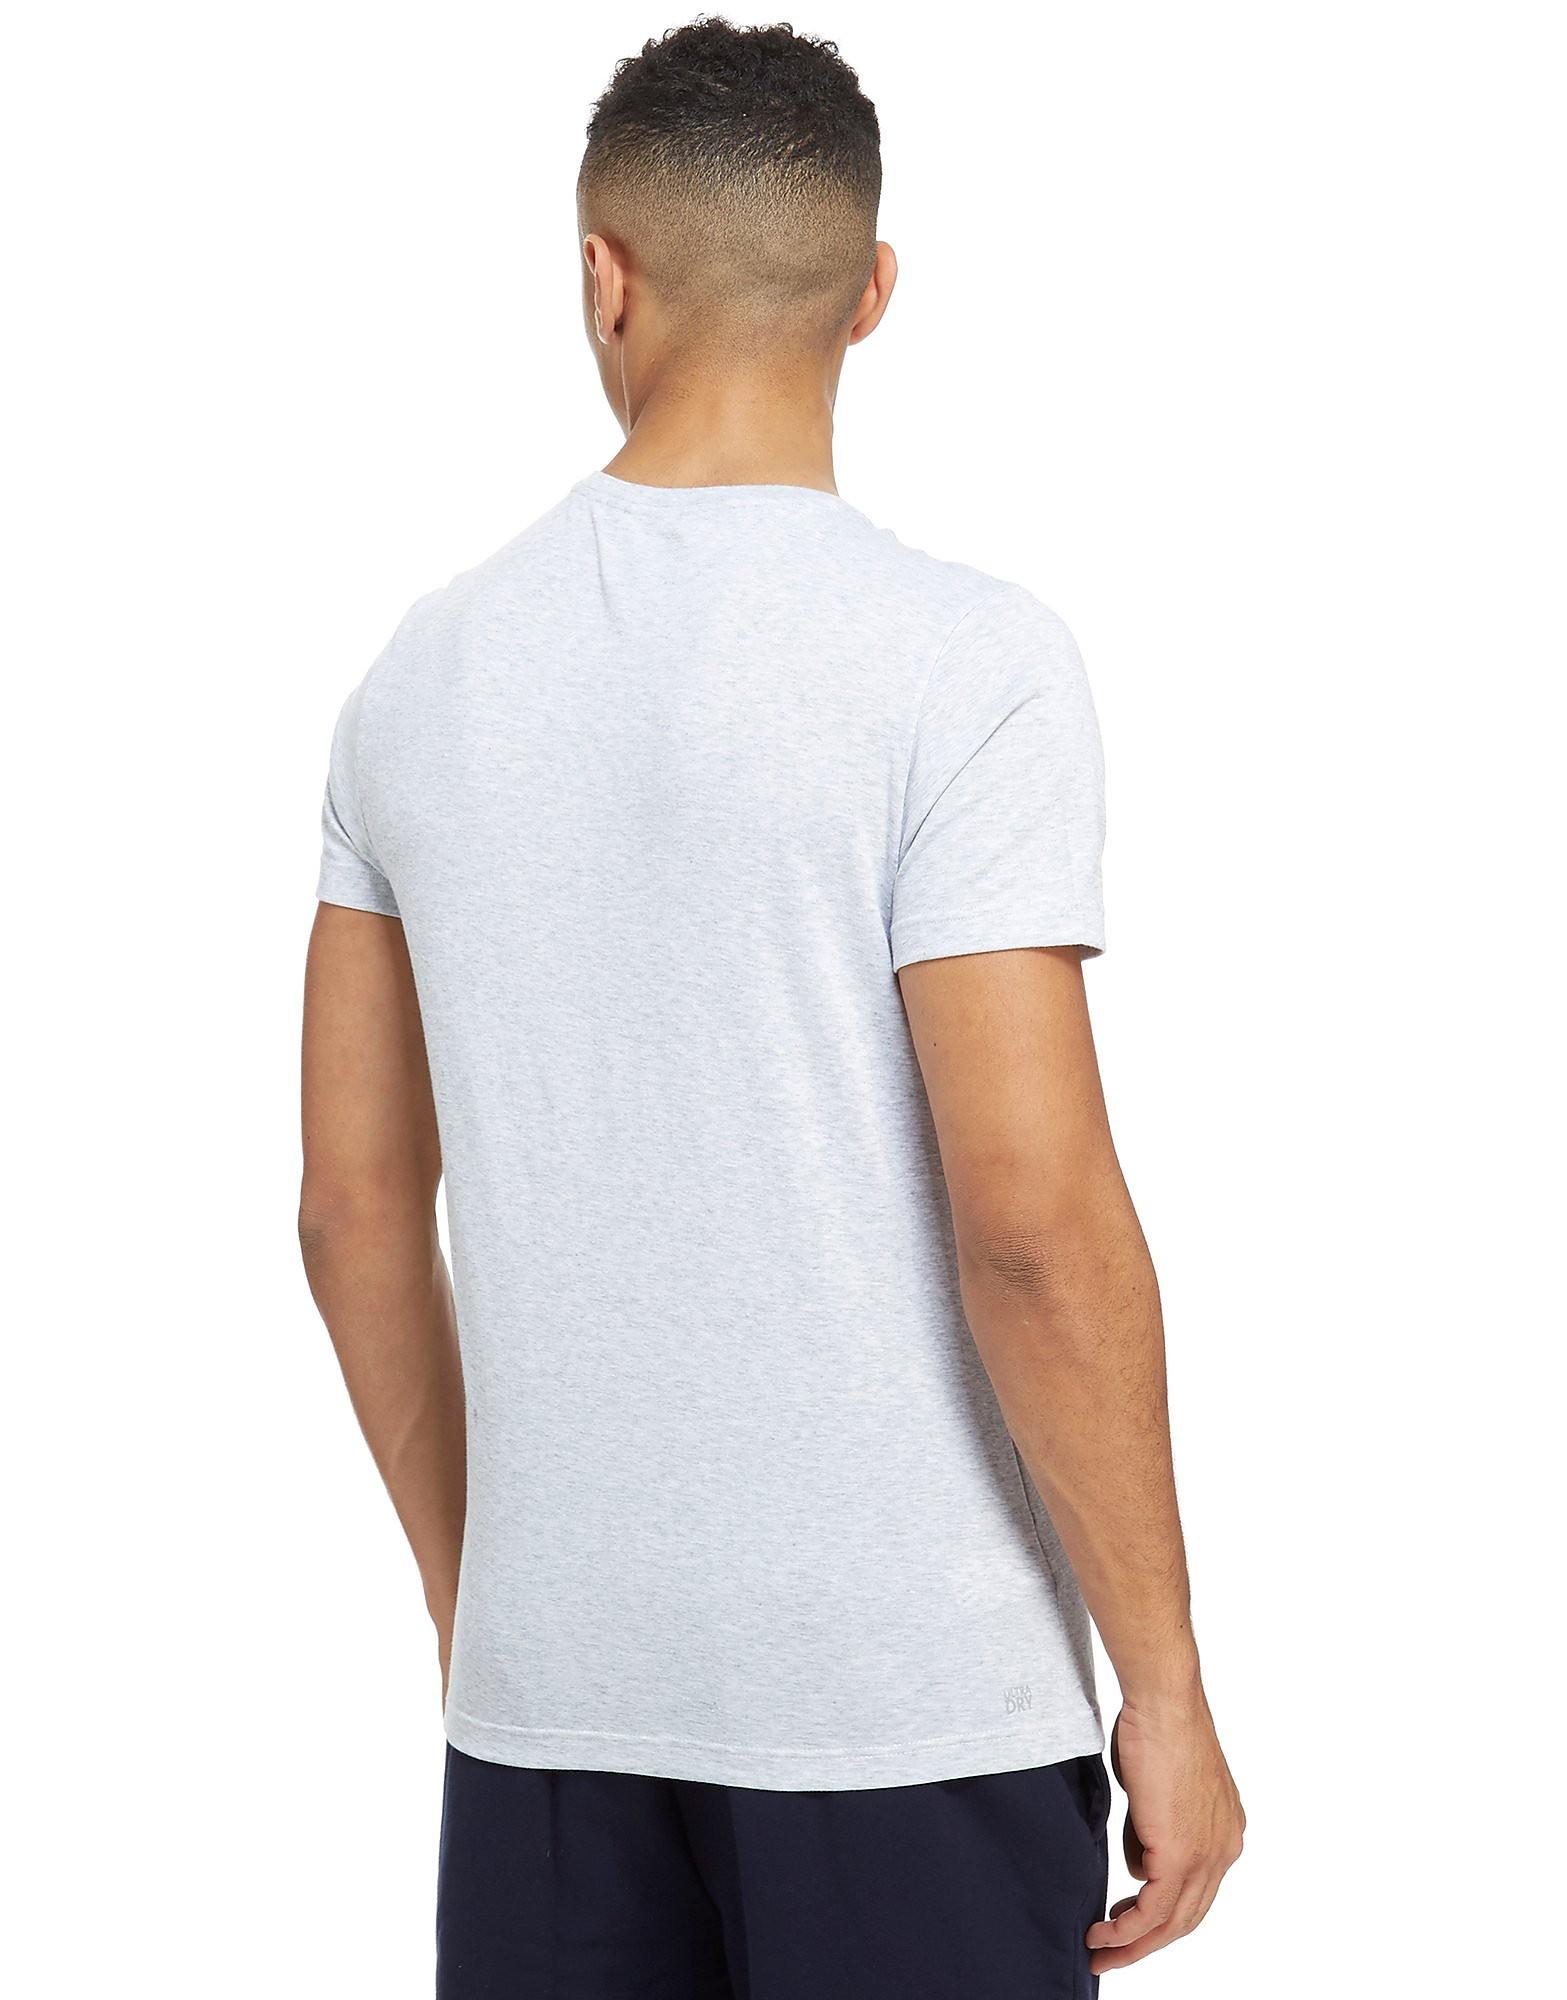 Lacoste Sport Text T-shirt